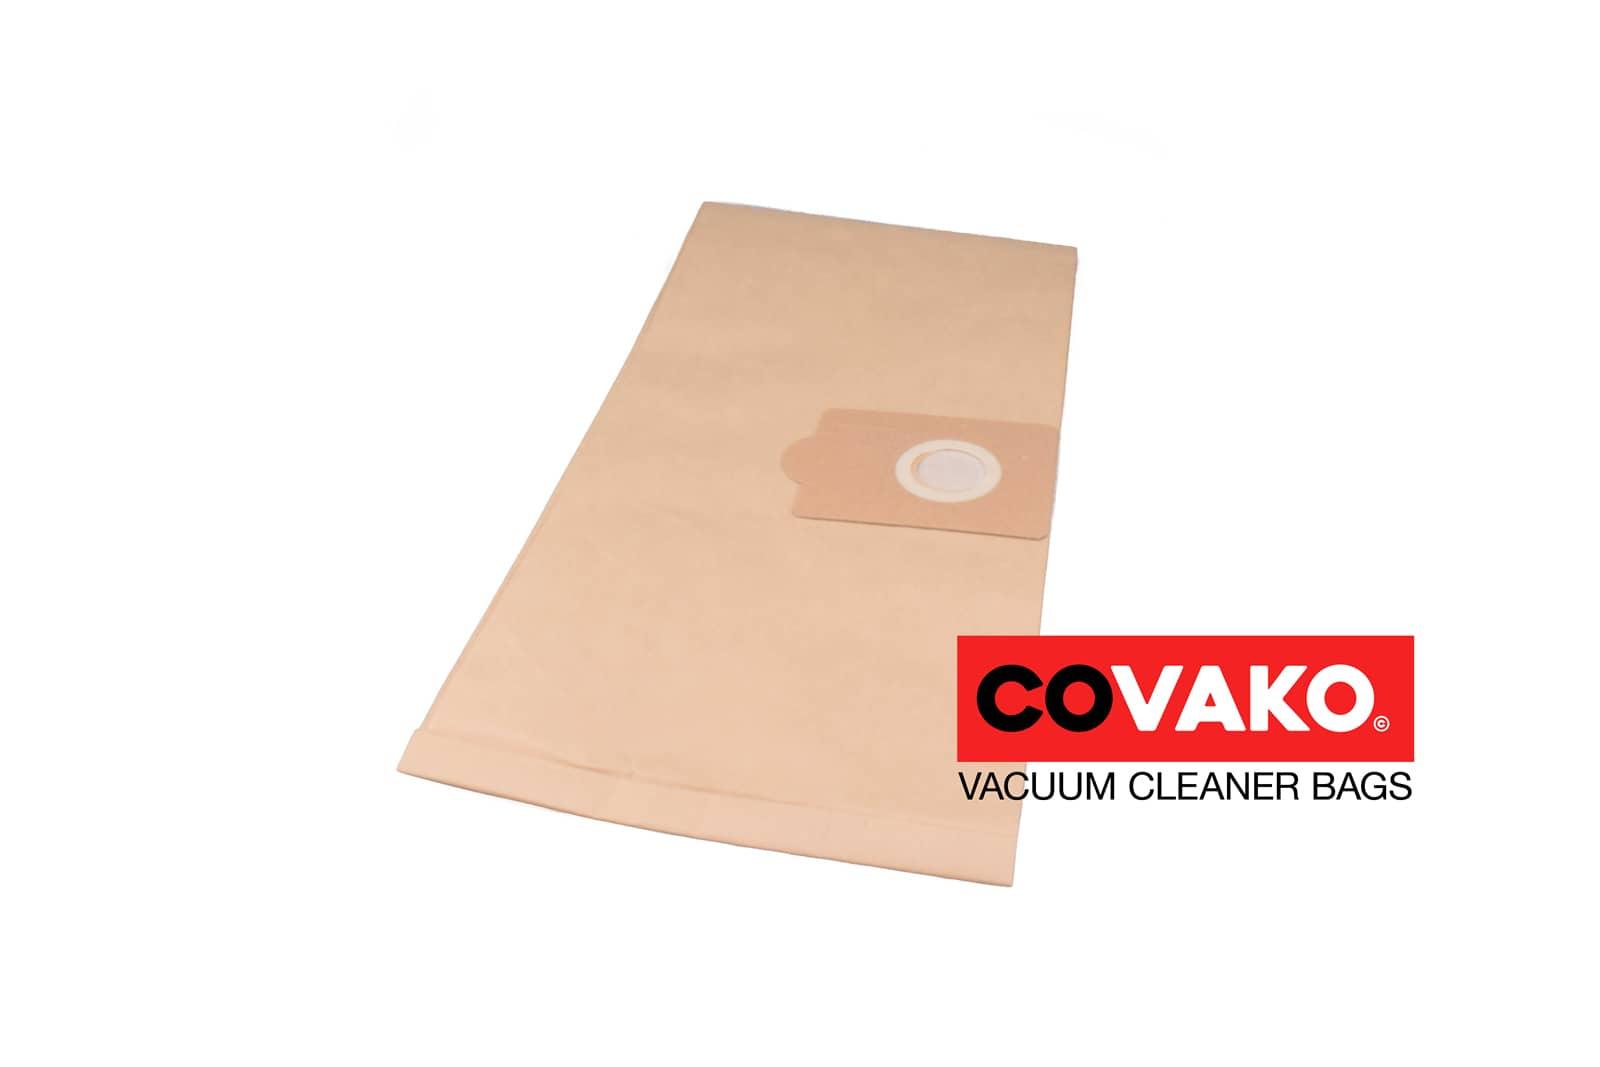 I-vac Silent 25 / Paper - I-vac vacuum cleaner bags